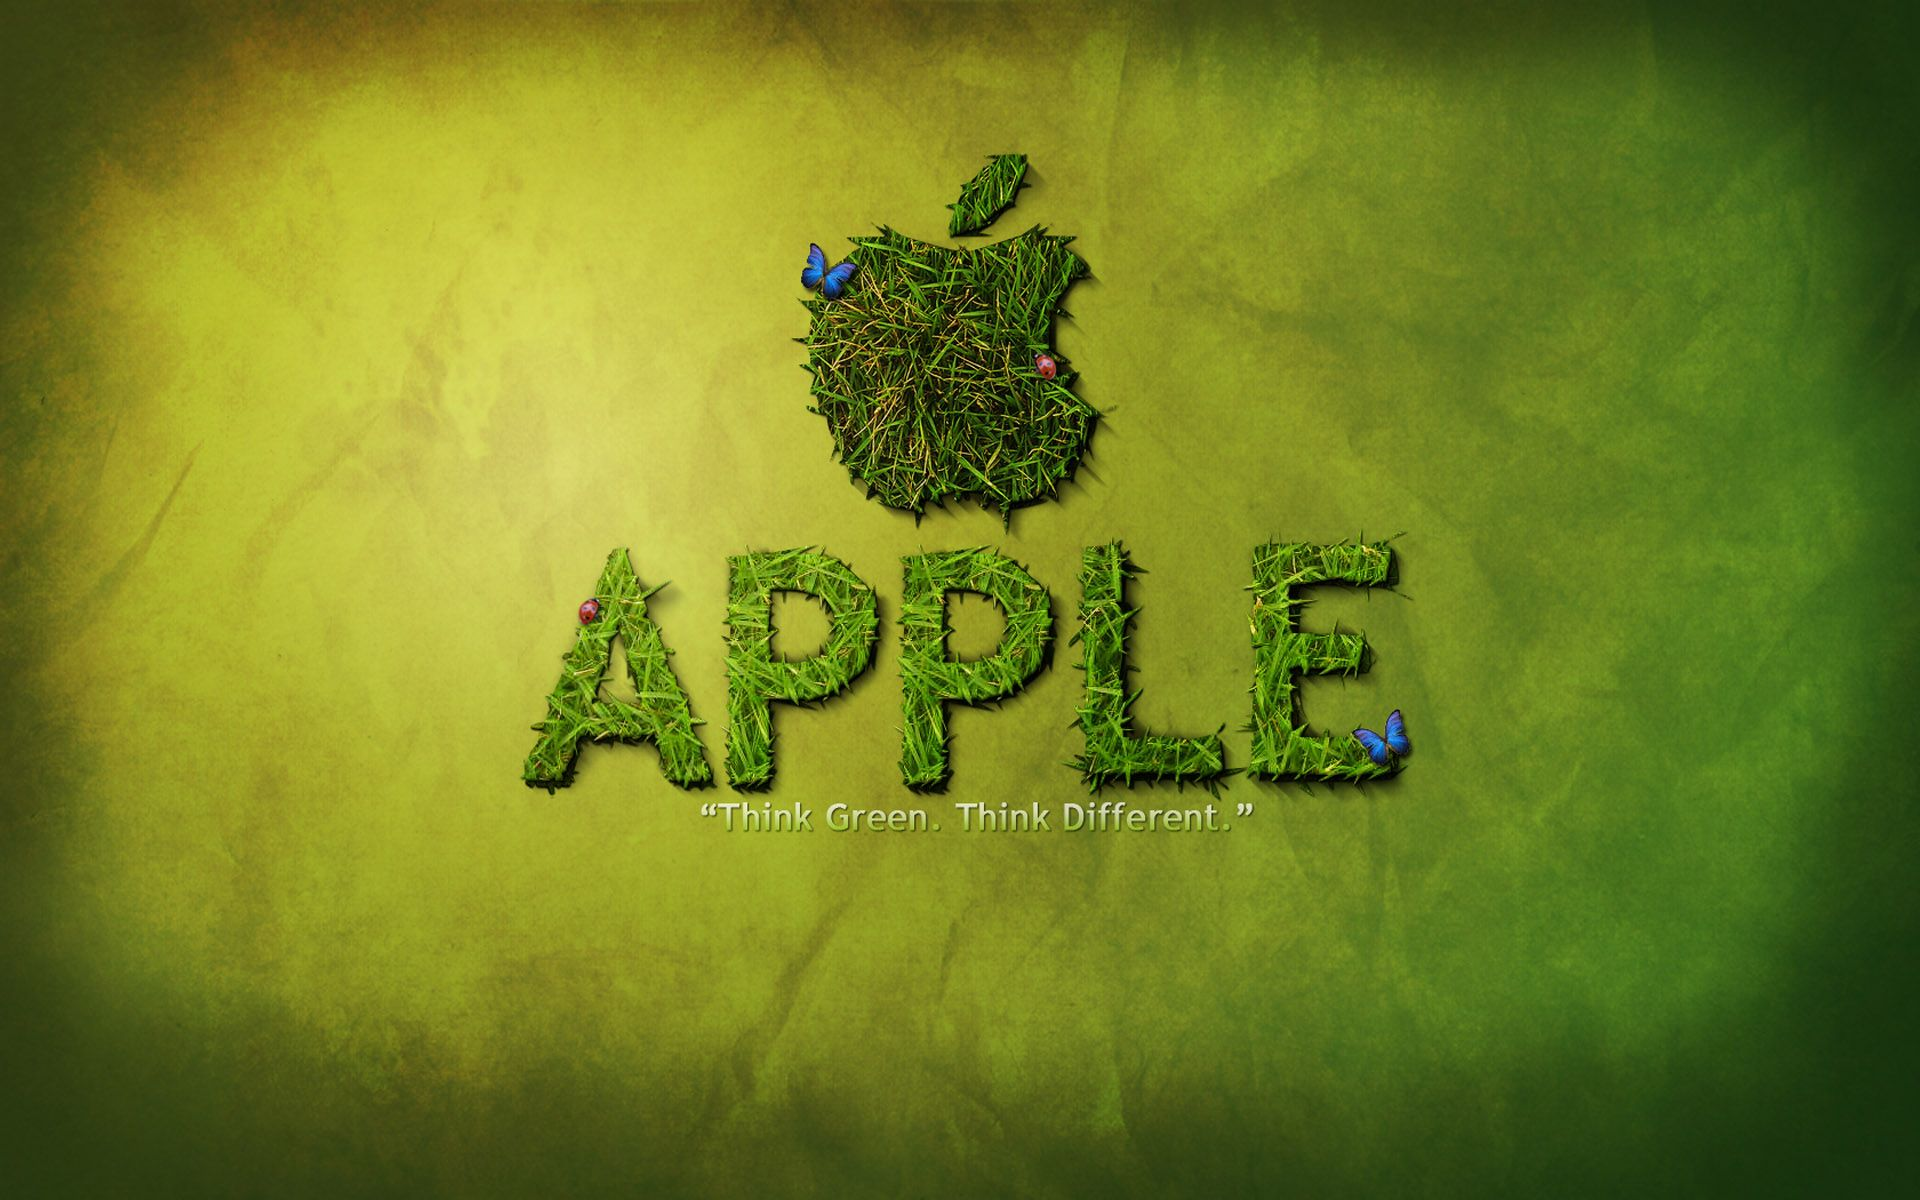 apple logo think green desktop wallpaper